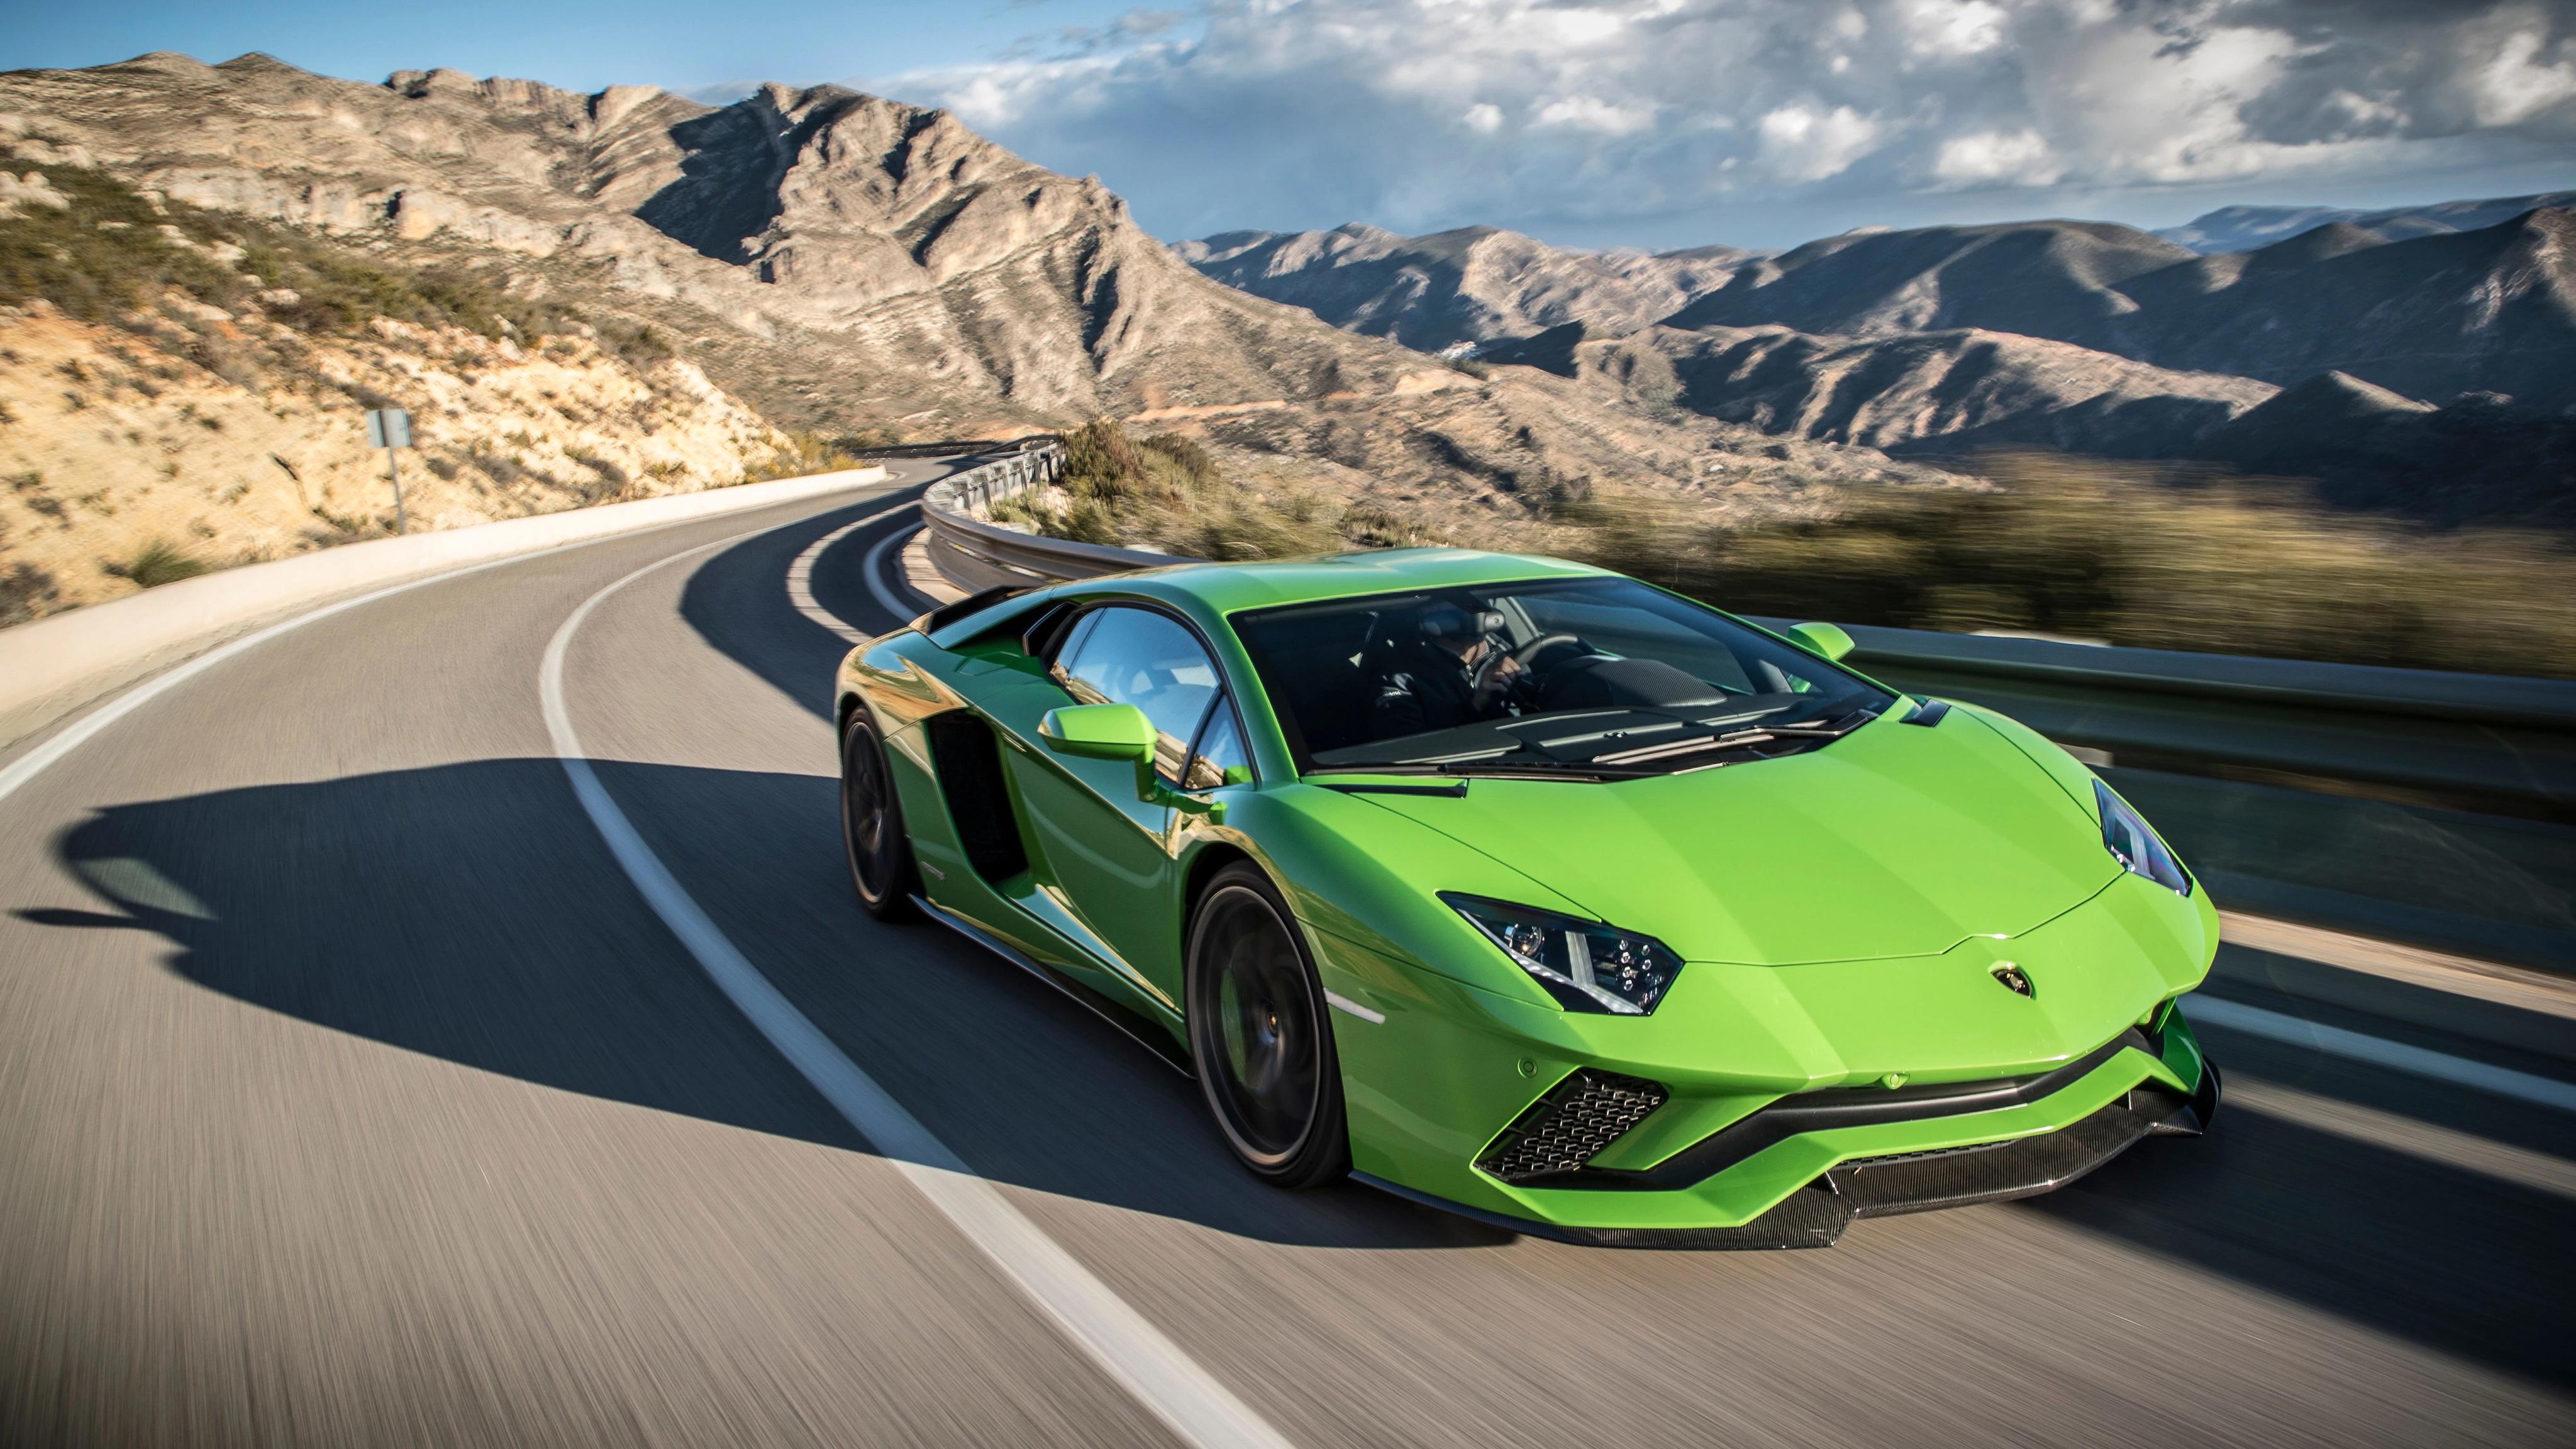 Lamborghini Aventador S 2017 4K